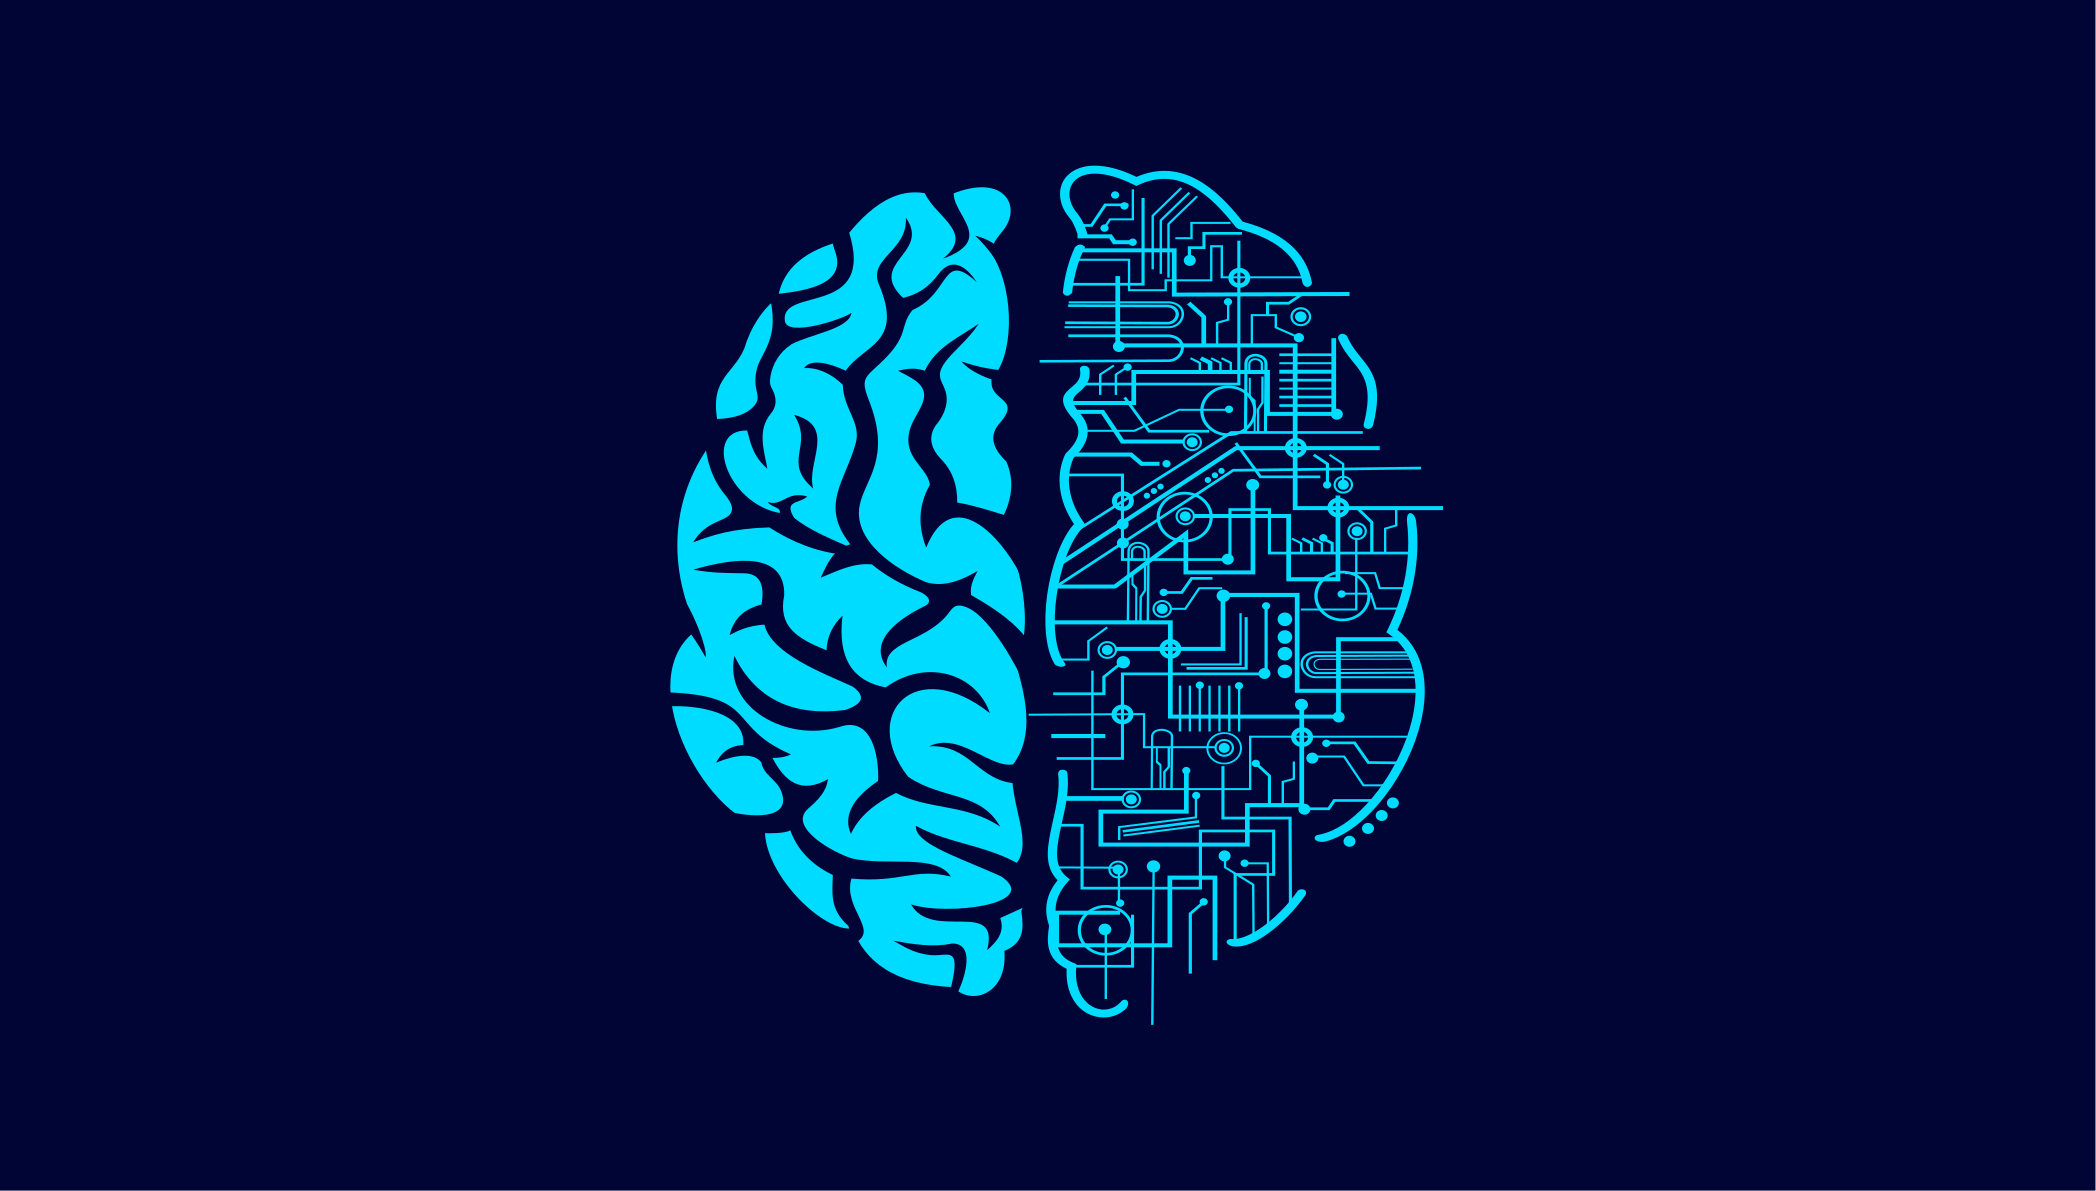 TenStickers. ηλεκτρικές σύγχρονες κουβέρτες εγκεφάλου. ένα πραγματικά όμορφο ηλεκτρικό μπλε χαλί βινυλίου εγκεφάλου για να προσθέσετε χαρακτήρα στα δάπεδα σας. επιλέξτε το μέγεθός σας και πάρτε τη διακόσμηση του σπιτιού σας.